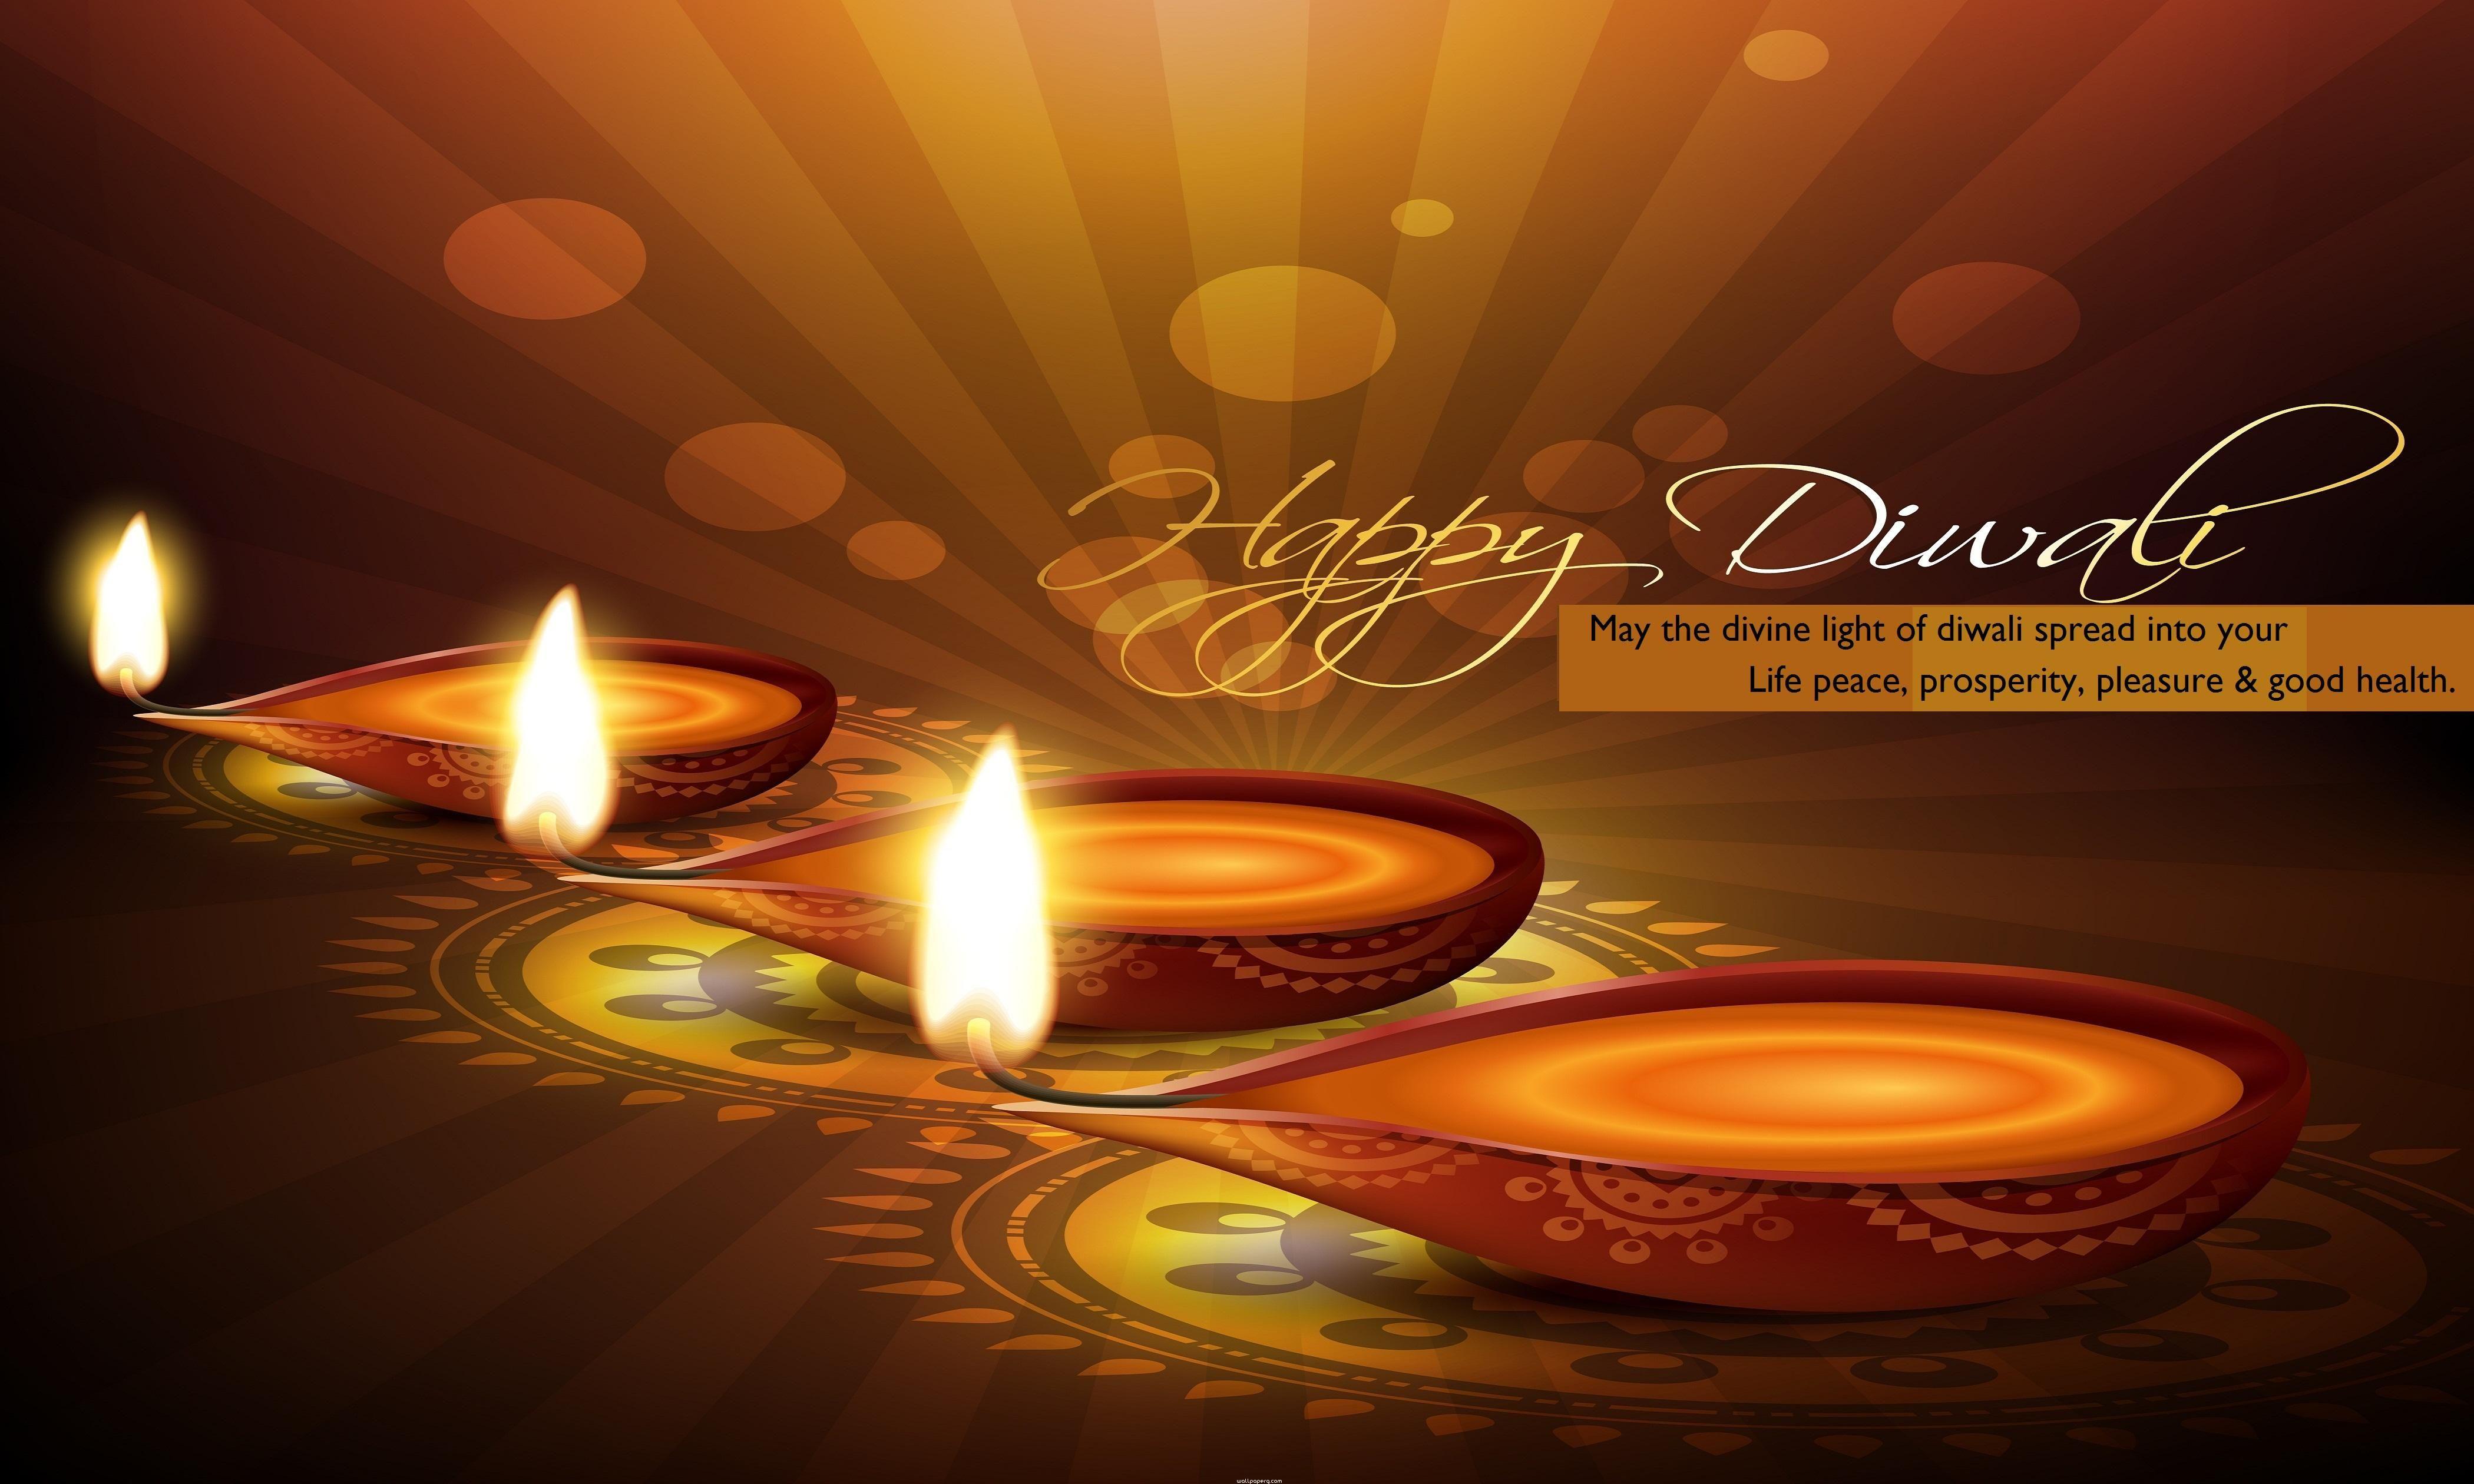 Amazing Wallpaper Mobile Diwali - 9b8610945ad5ccc37f664e908dc69922  Graphic_656945.jpg